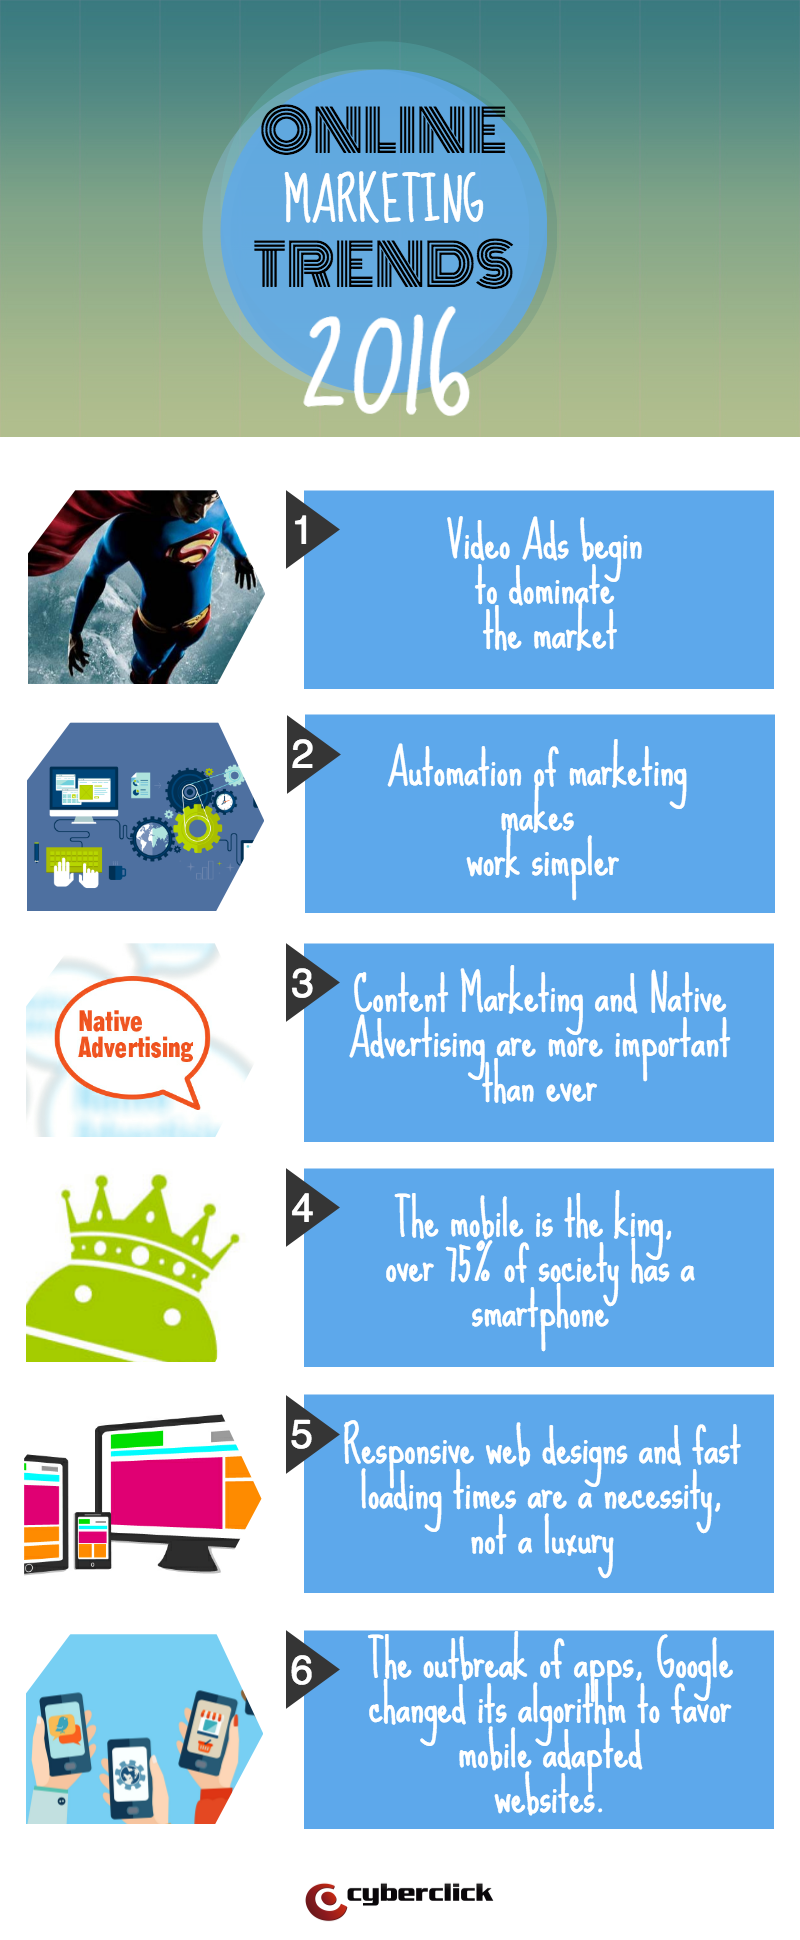 Online Marketing Trends 2016